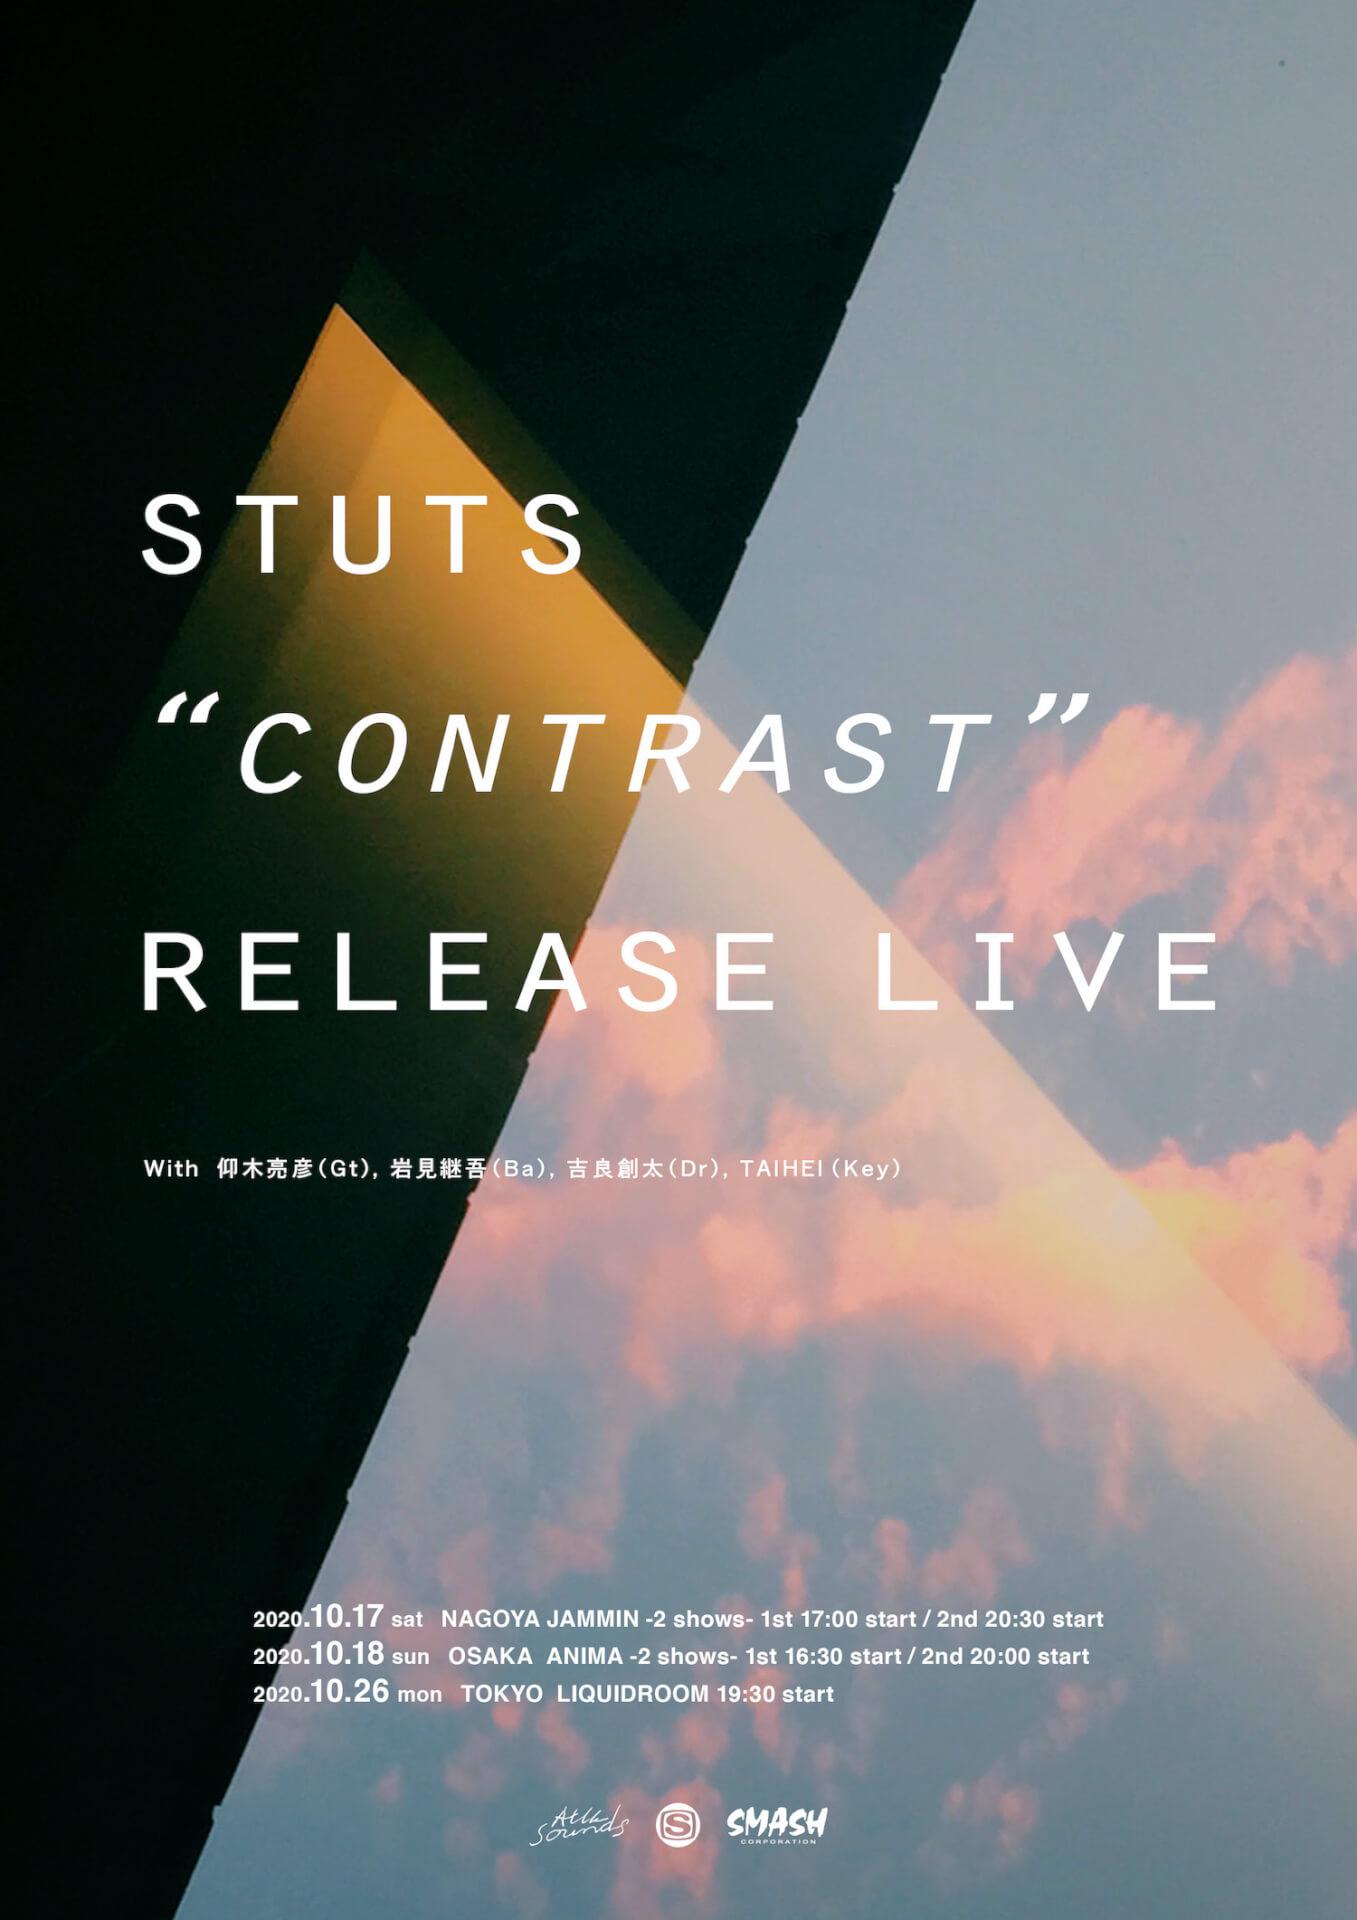 STUTSインタビュー|新作『Contrast』でも表われるヒップホップへの変わらない敬愛 insterview0914_stuts_tour